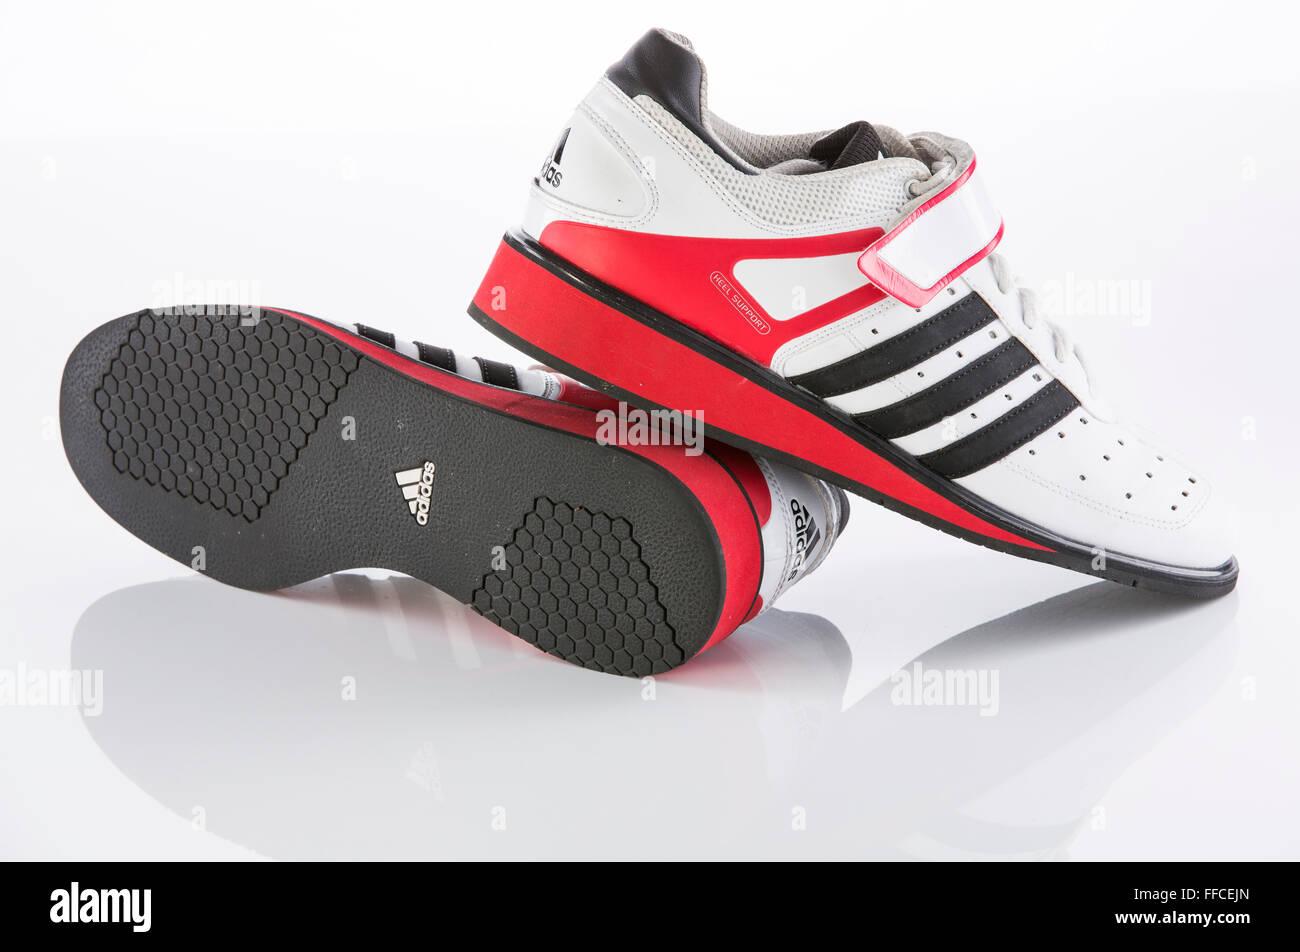 Images Alamy amp; Page Photos Adidas 8 TqBaRWw